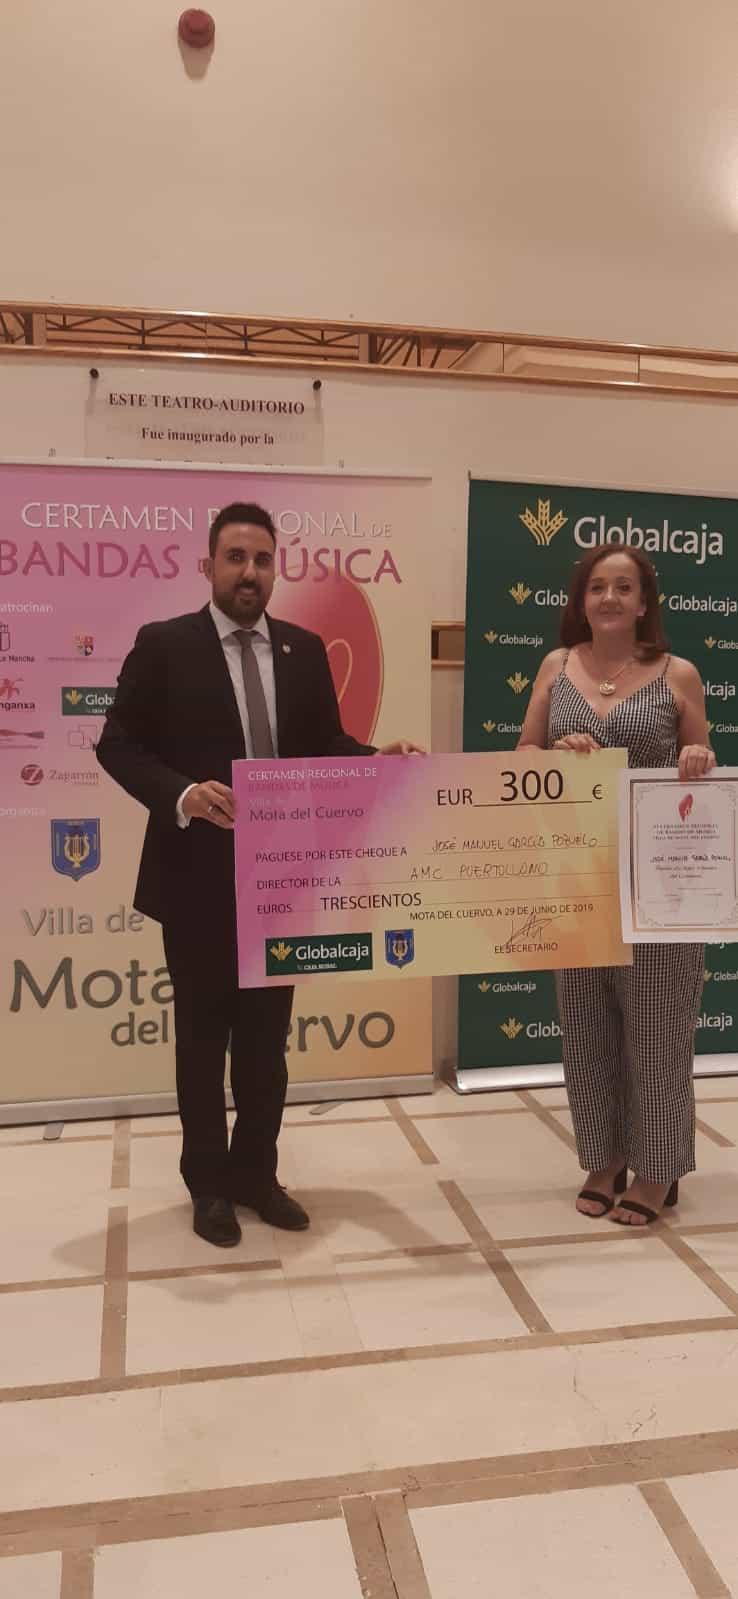 https://blog.globalcaja.es/wp-content/uploads/2019/07/Certamen-Vila-Mota-del-Cuervojpg.jpg